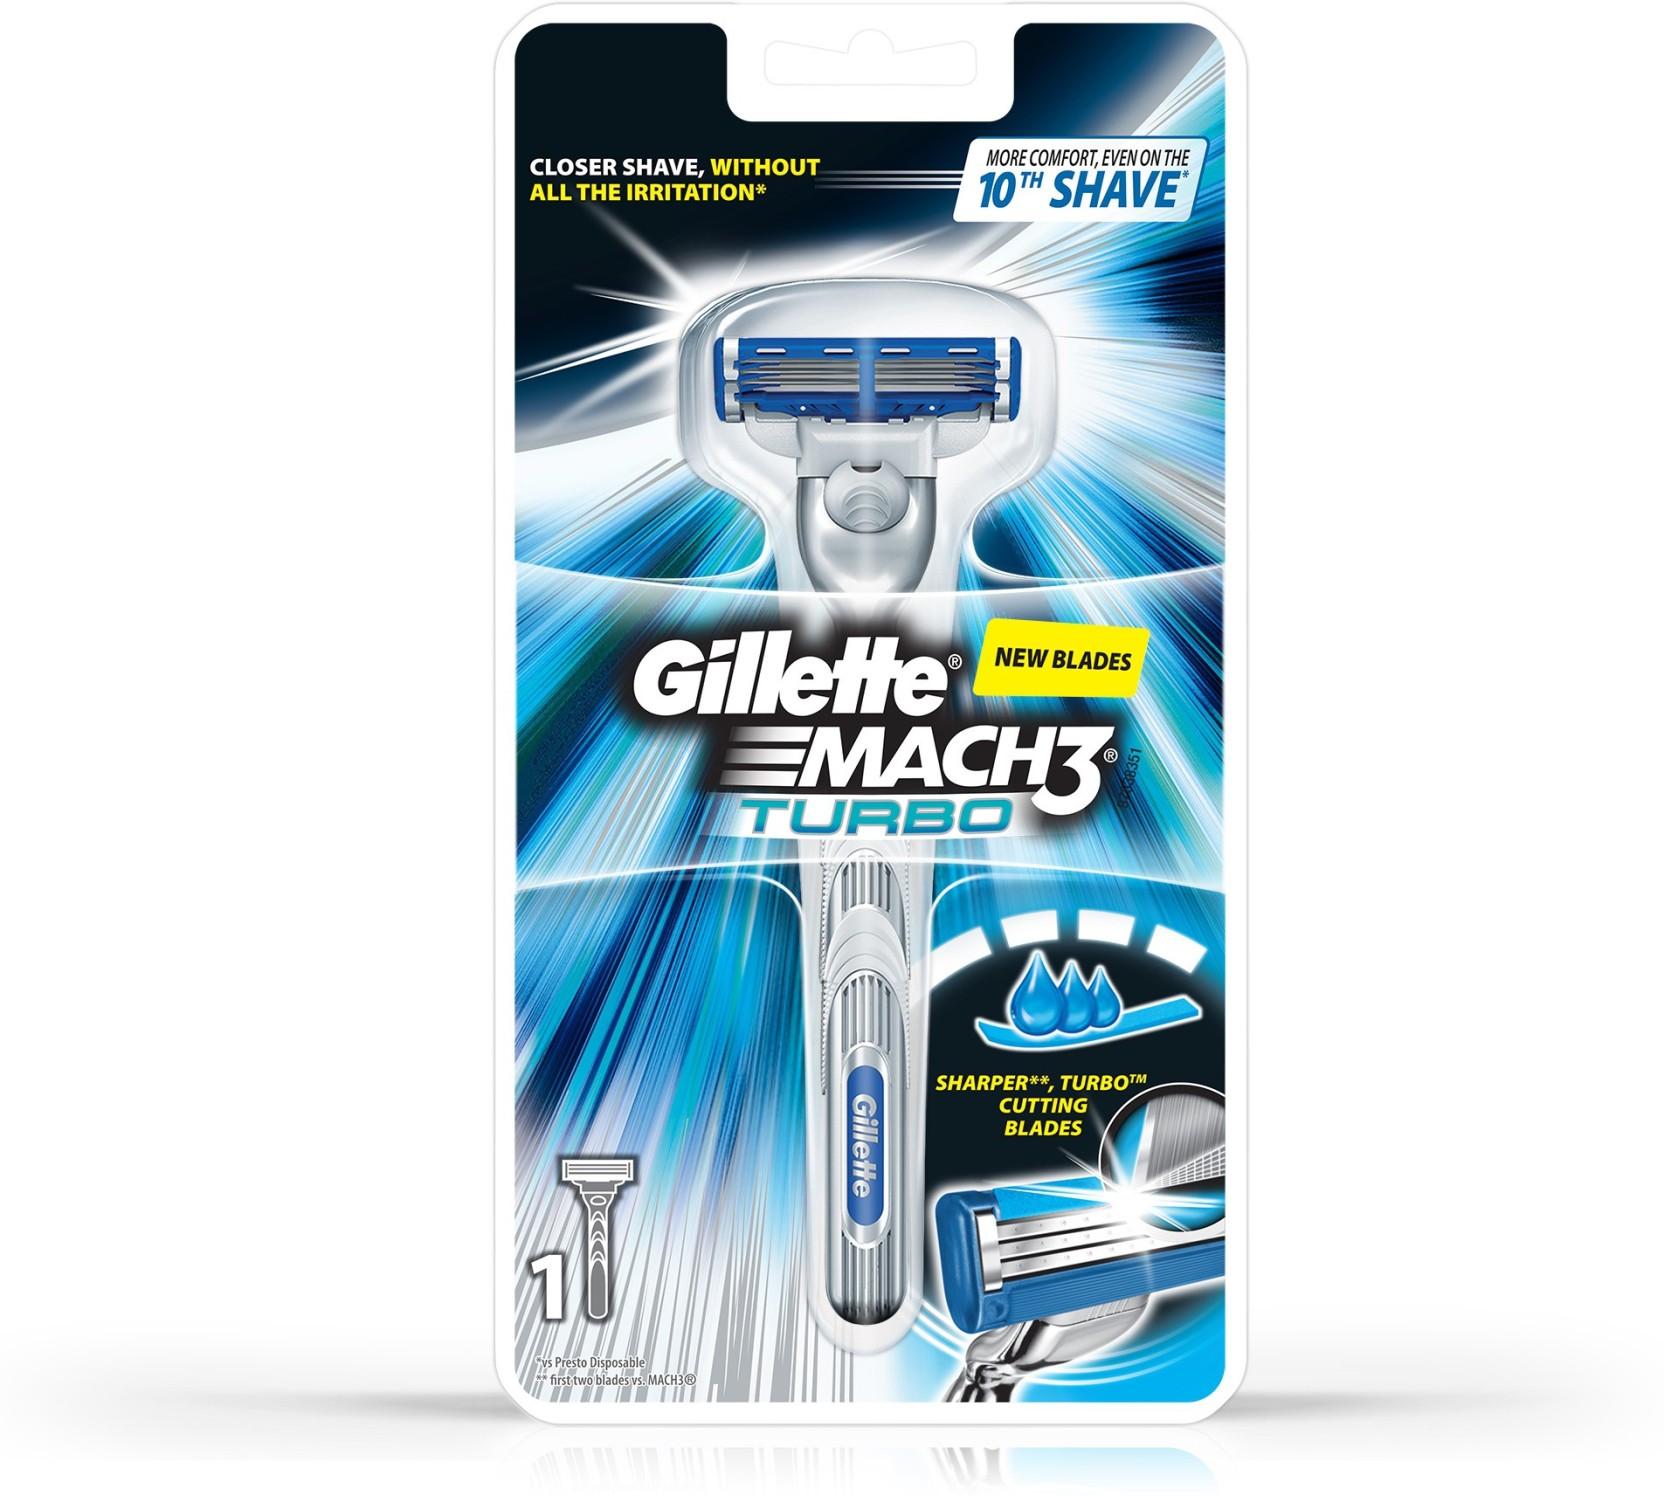 Gillette Mach 3 Turbo Razor Price In India Buy Gillette